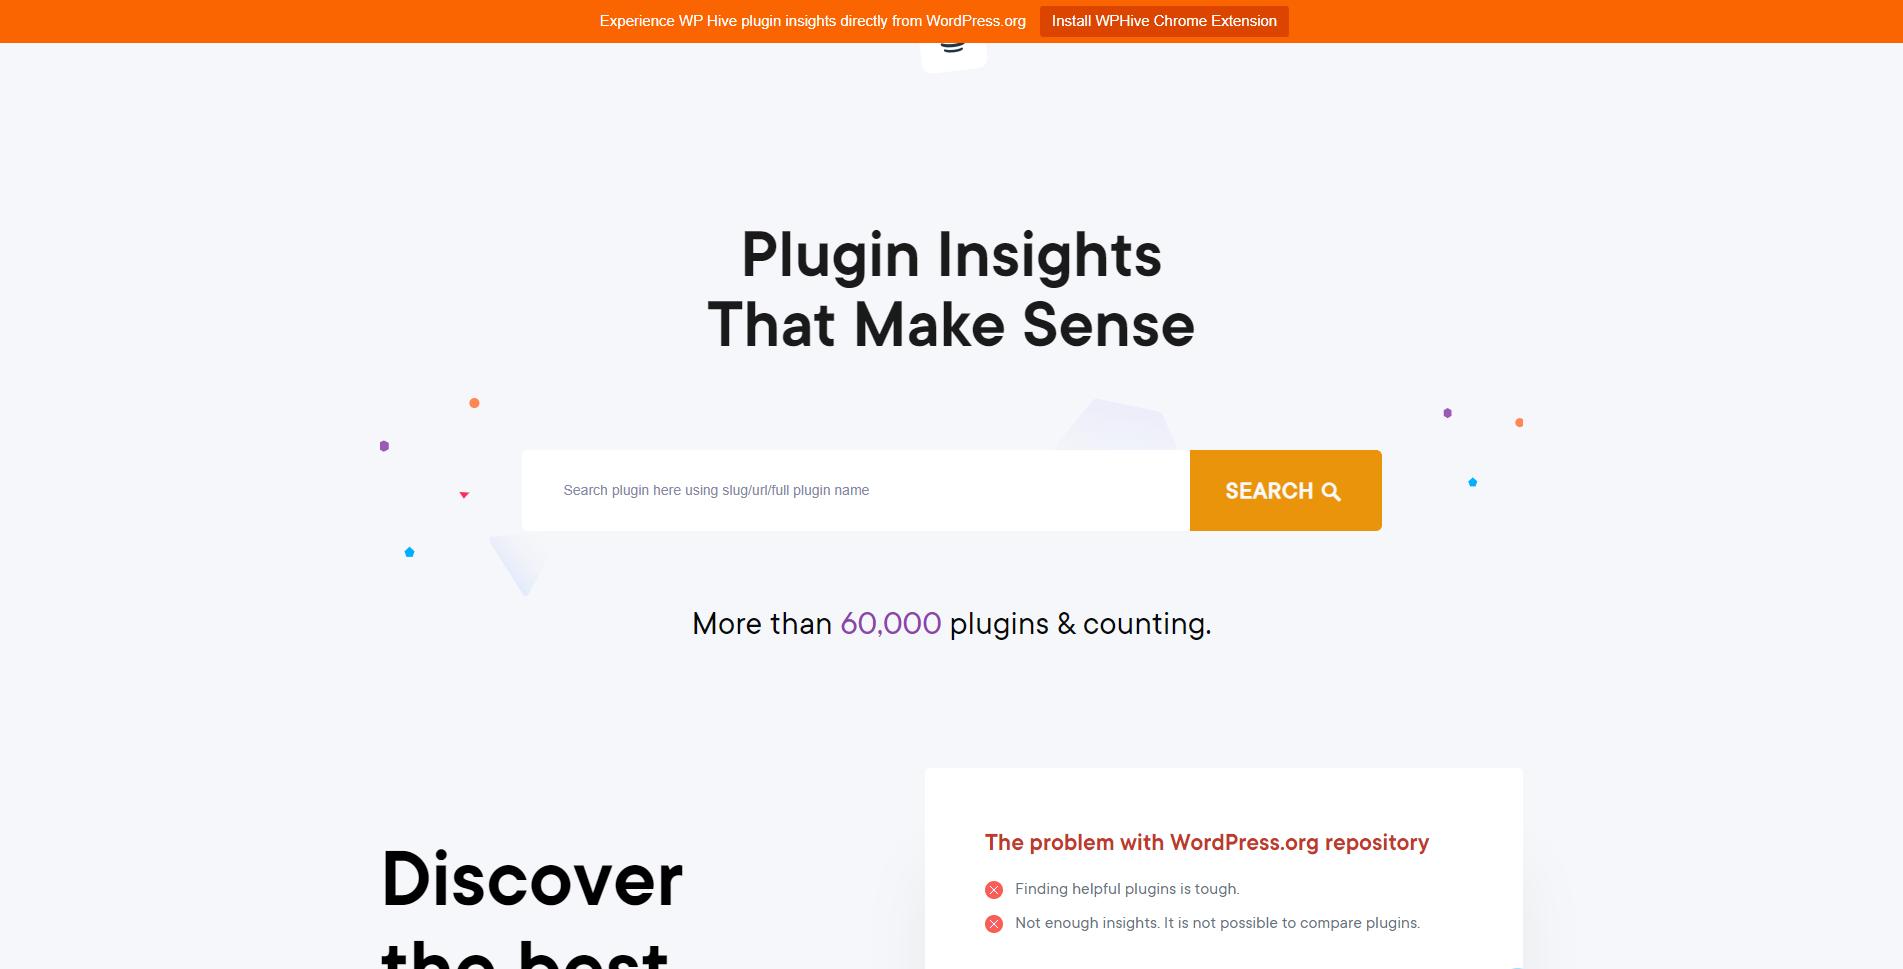 wp hive plugin search engine